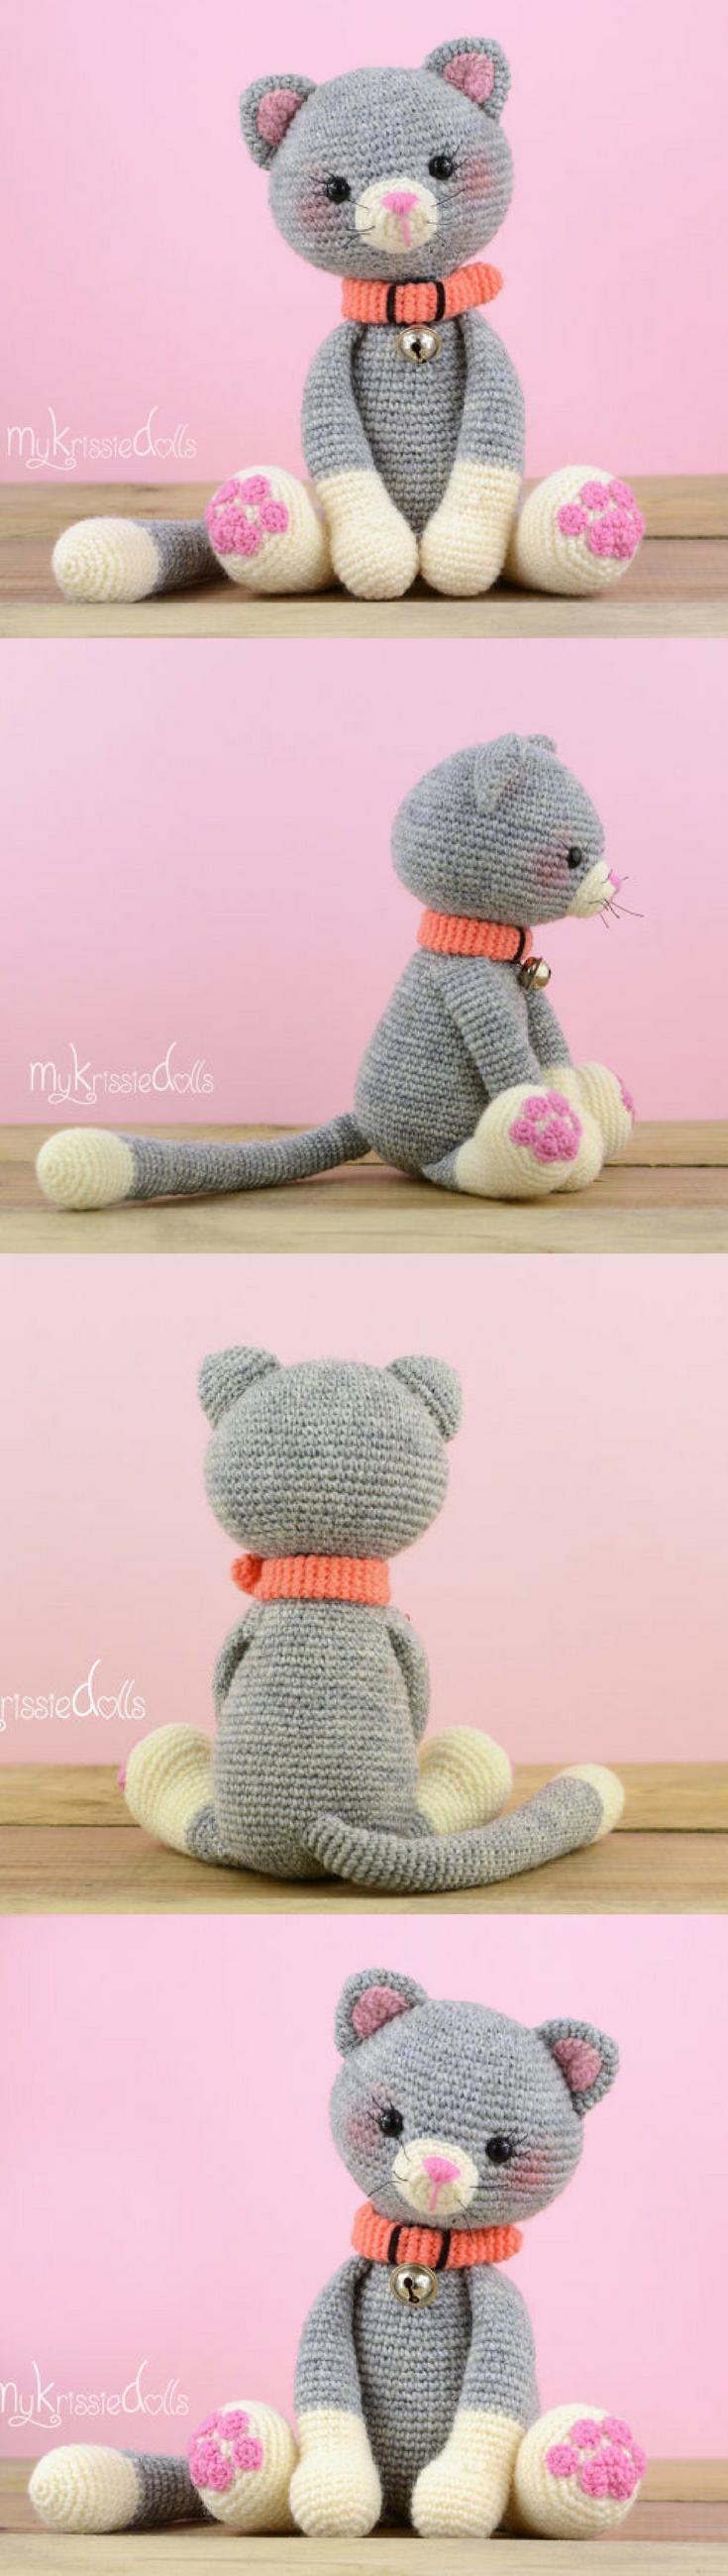 Amigurumi My Little Kitty Crochet Pattern Printable PDF #ad #amigurumi #amigurumidoll #amigurumipattern #amigurumitoy #amigurumiaddict #crochet #crocheting #crochetpattern #pattern #patternsforcrochet #printable #instantdownload